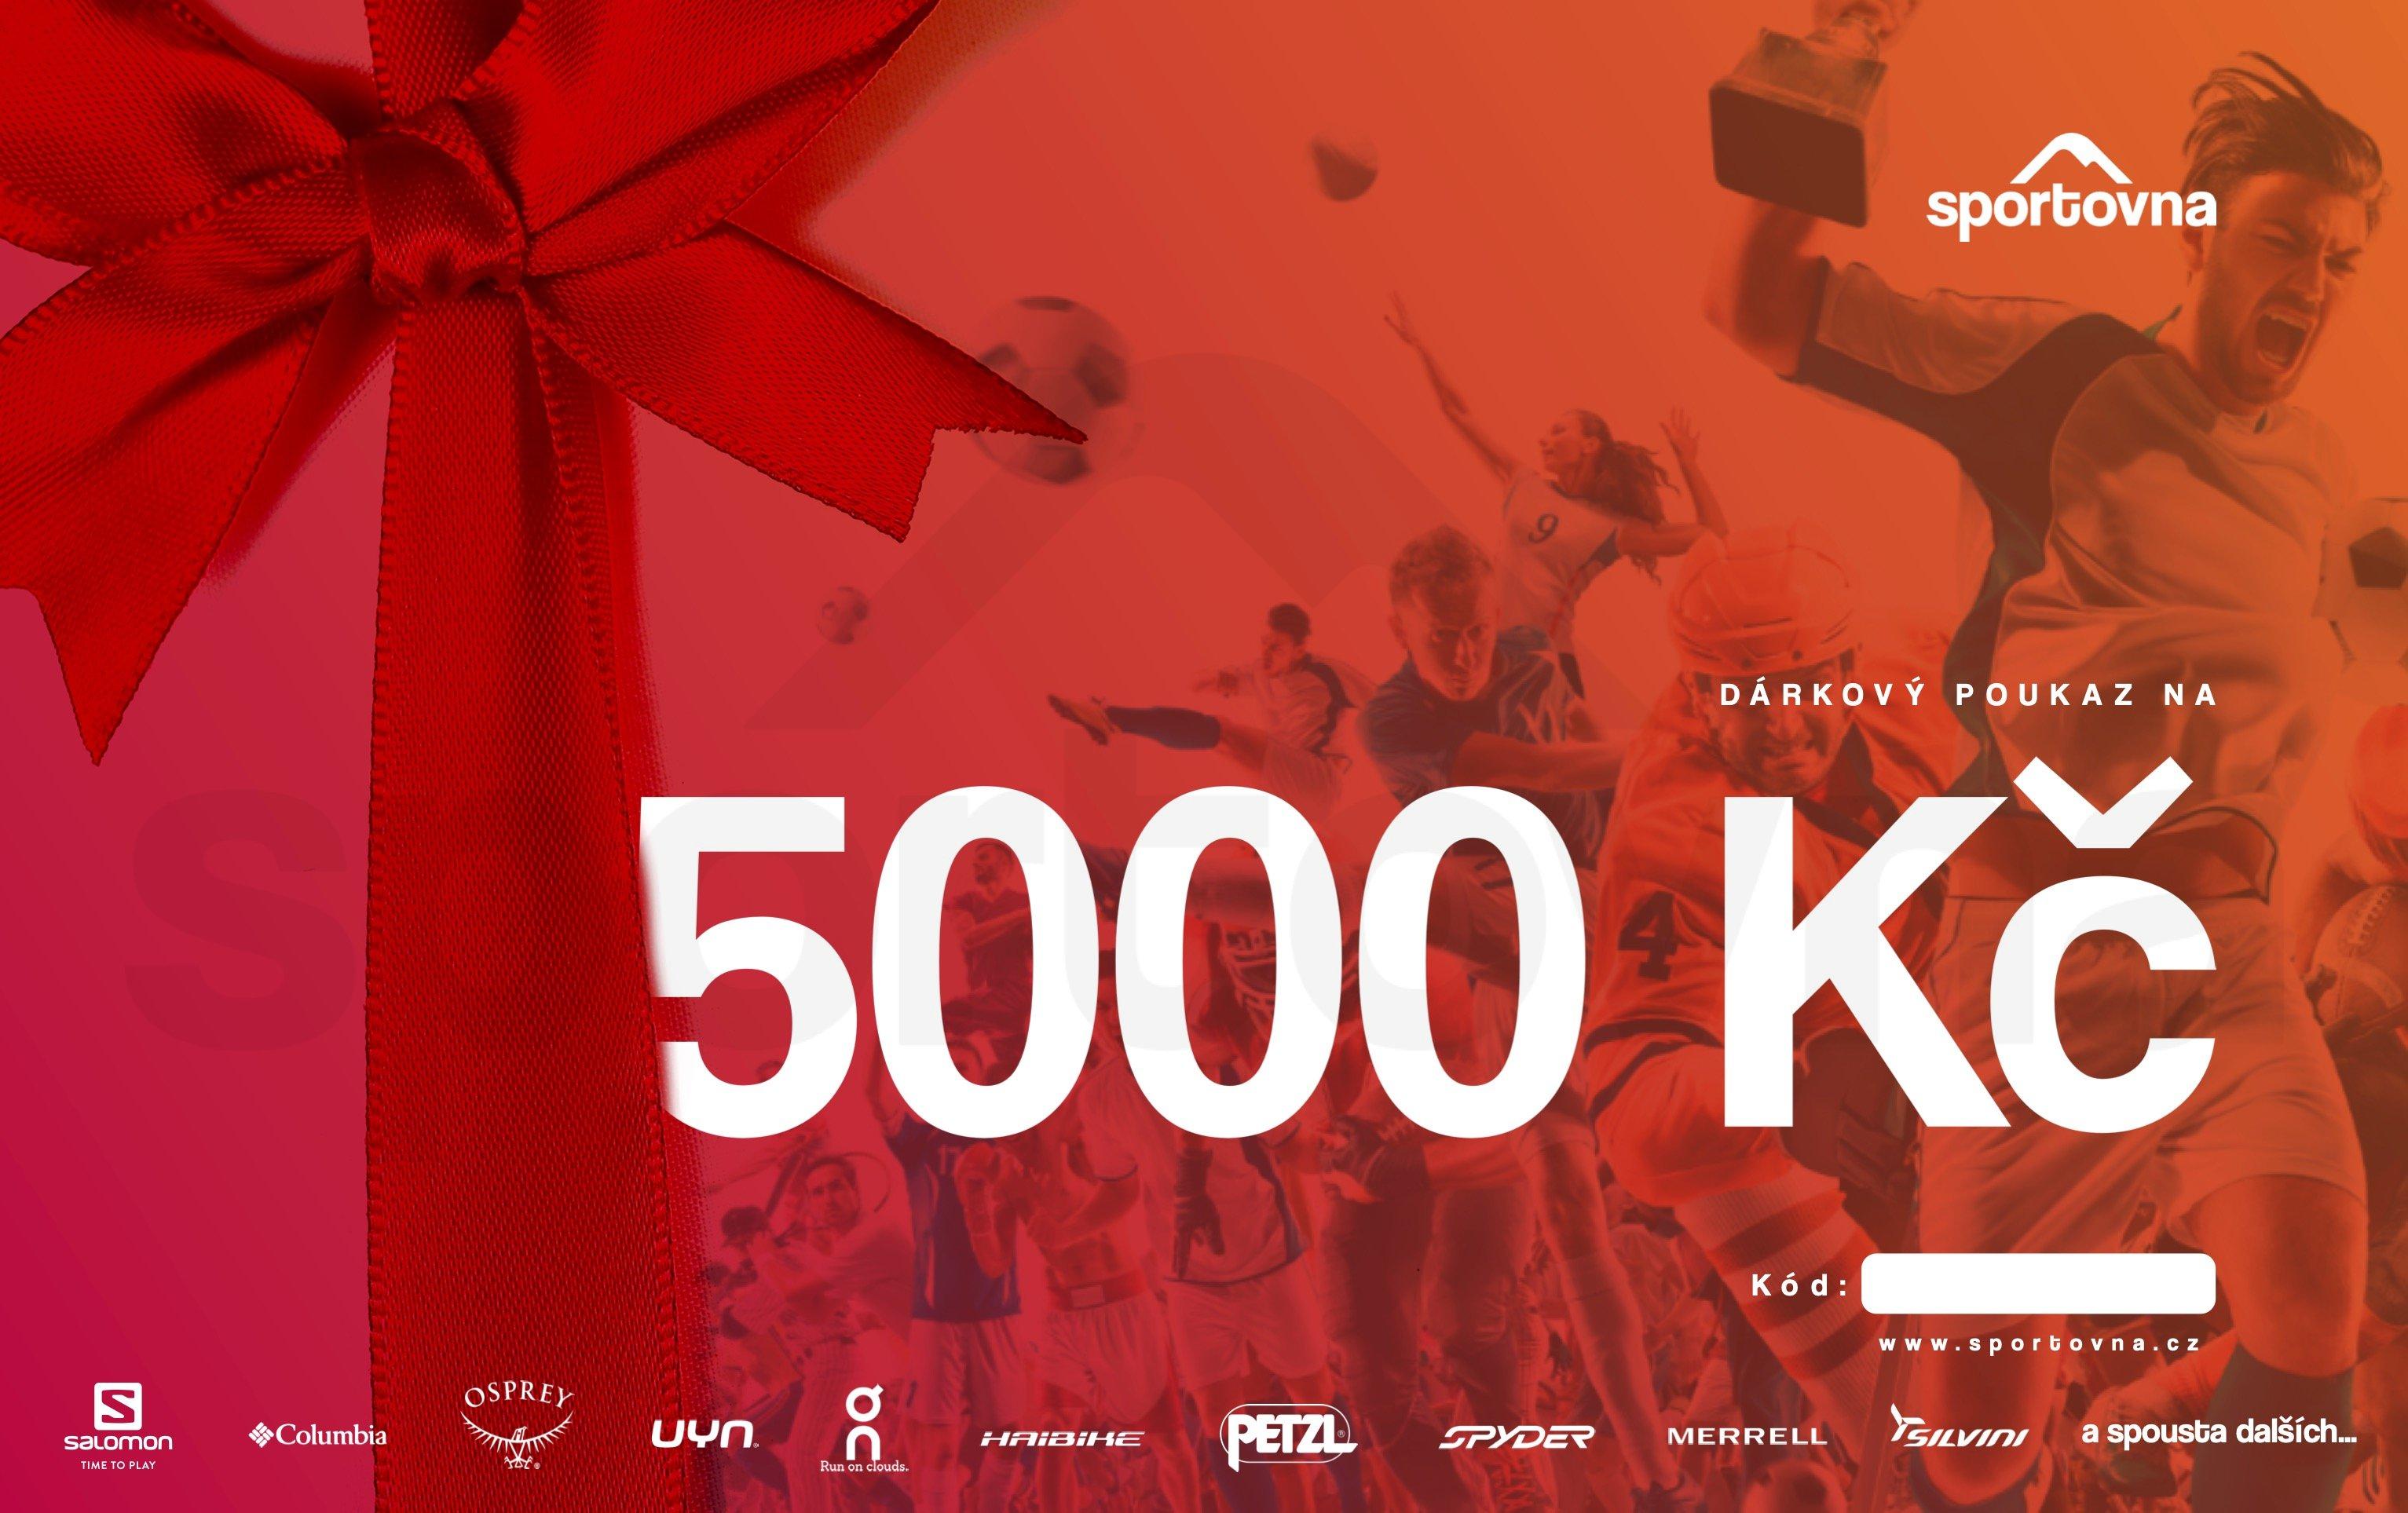 Poukaz 5000 Kč na nákup na eshopu sportovna.cz